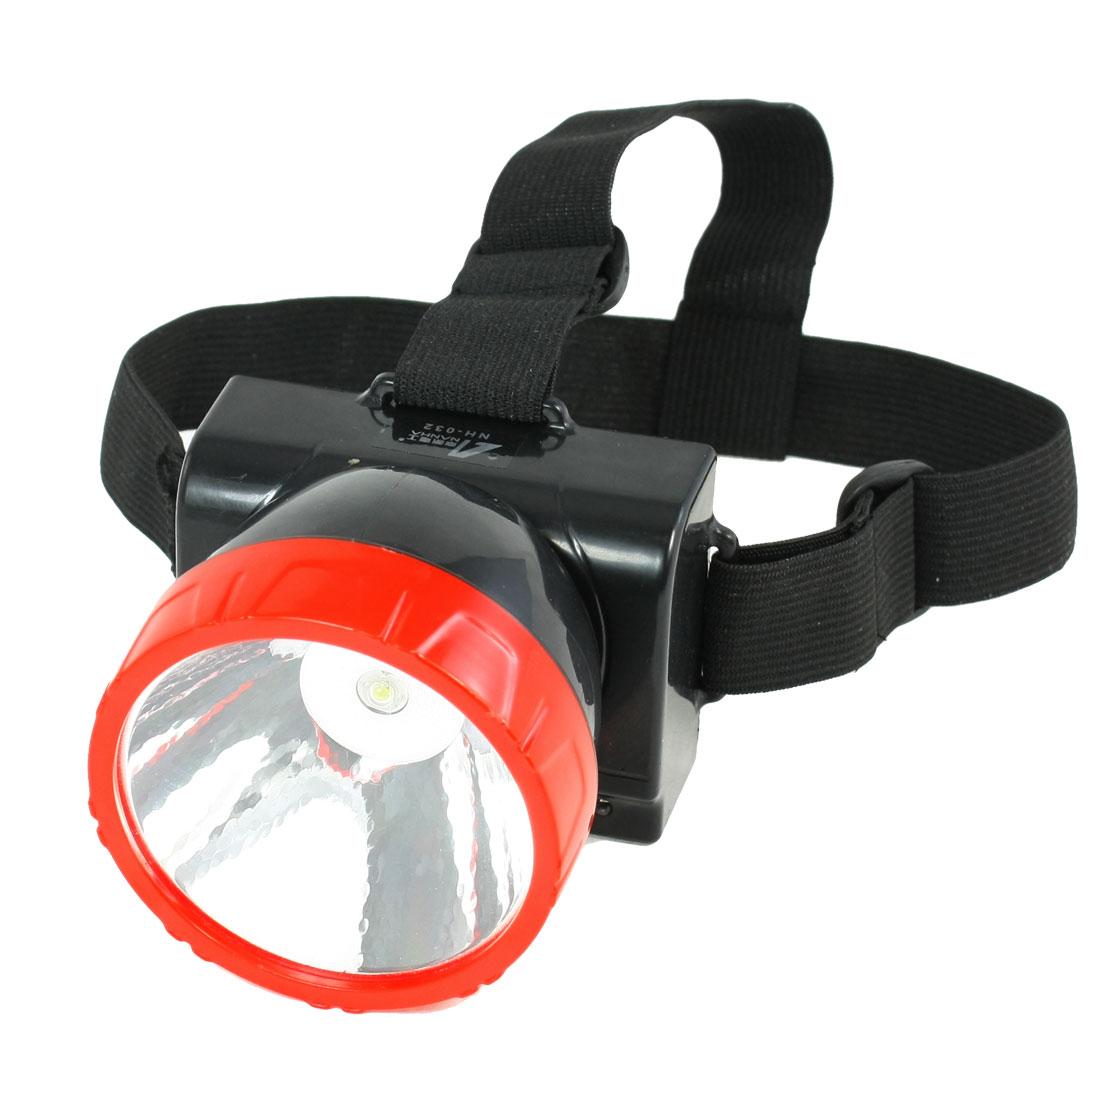 AC 110V/220V US Plug 1 White LED Head Torch Headlamp Light